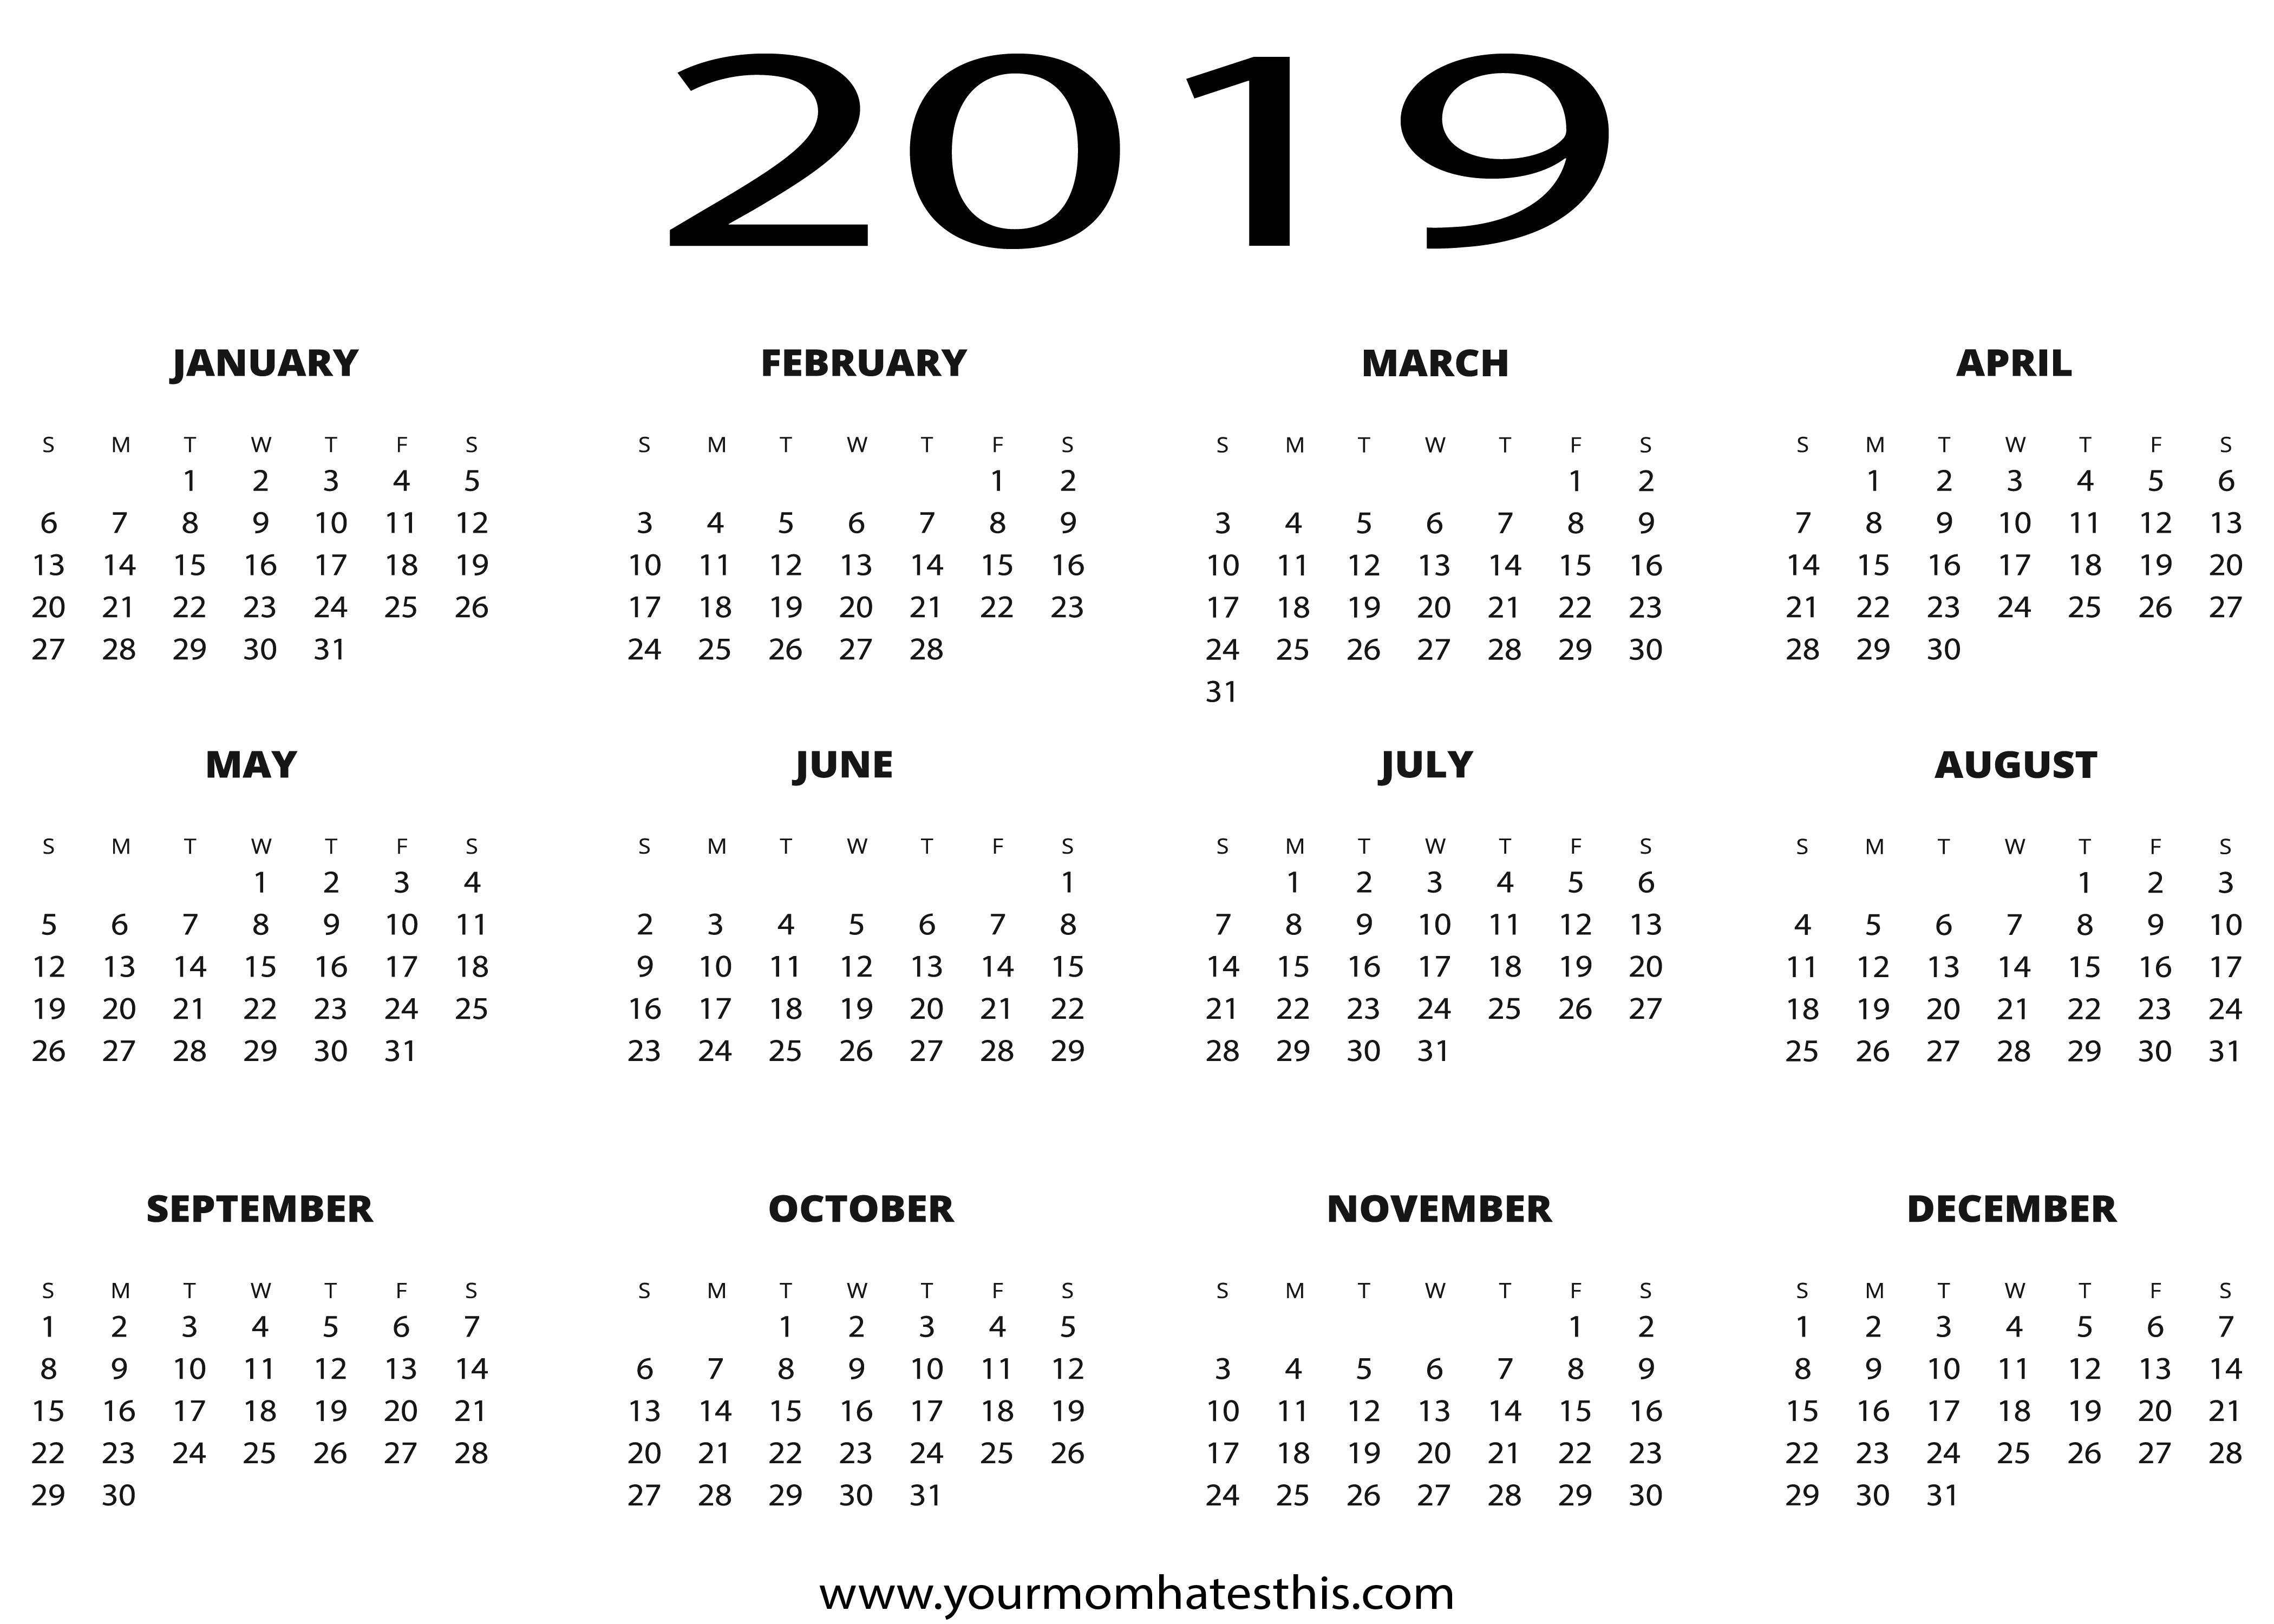 2019 Calendars Download Pdf Templates Calendar 2019 Full Year